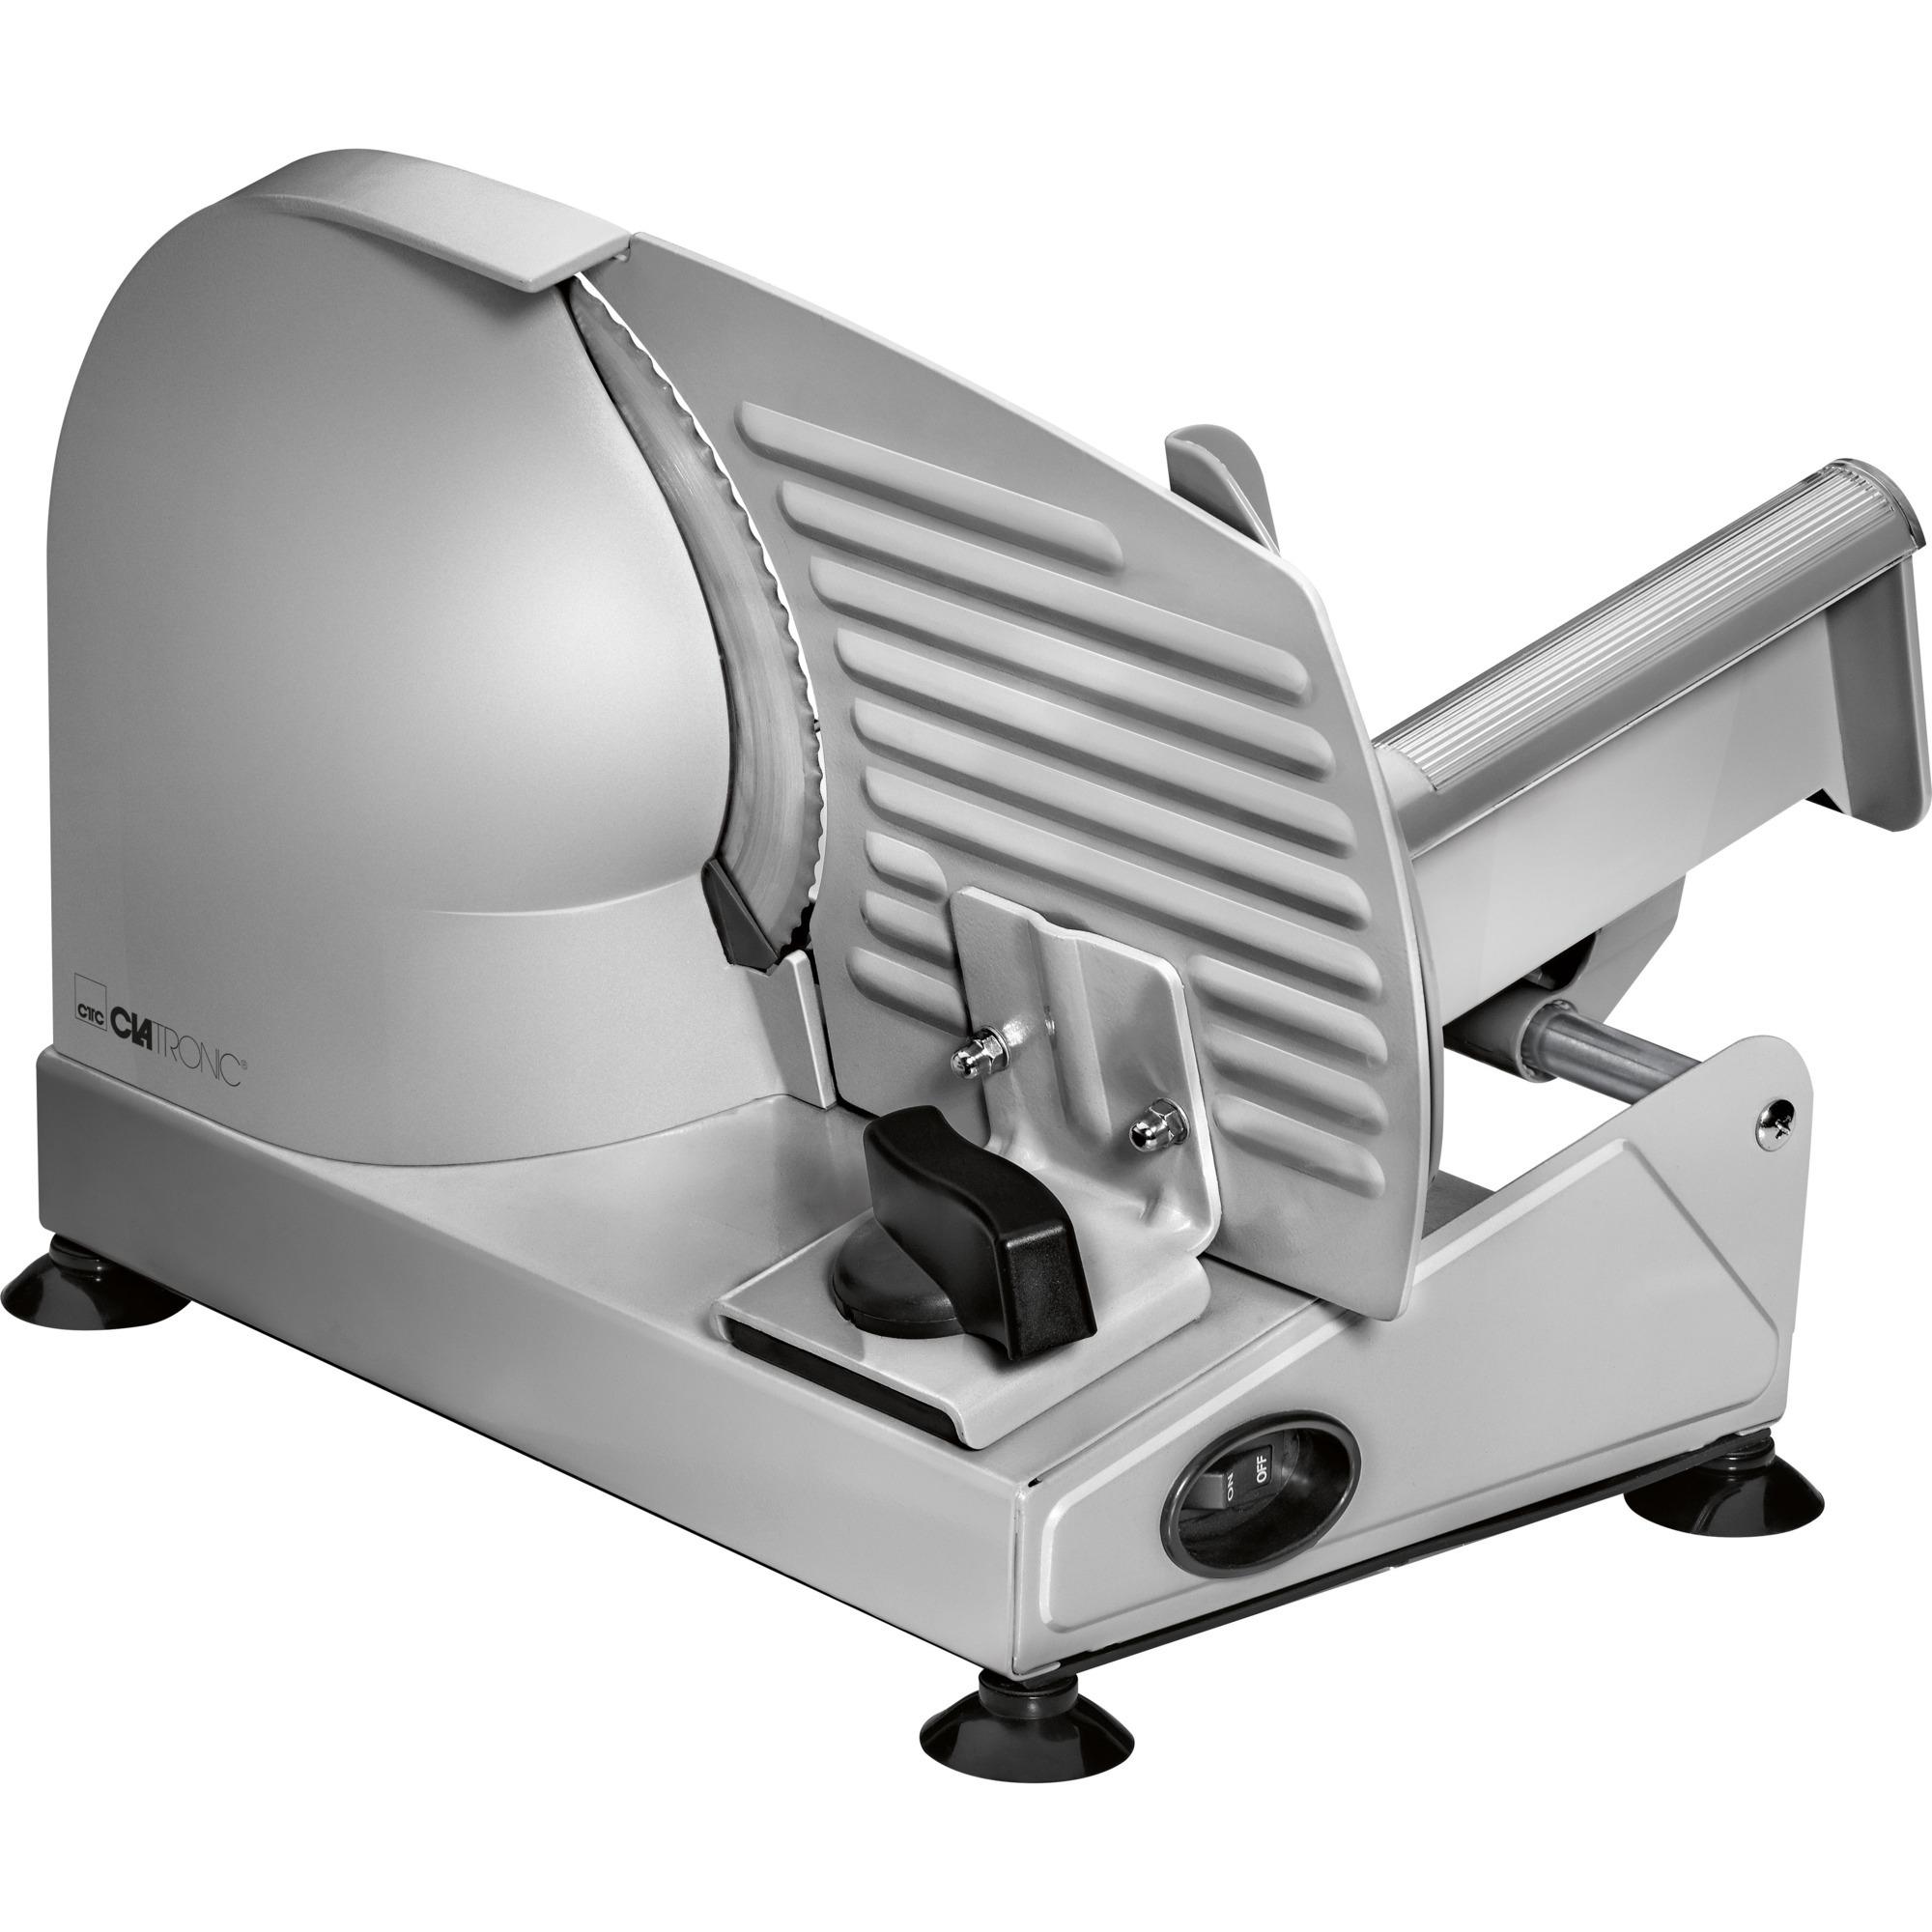 MA 3585 rebanadora Eléctrico Metálico Metal 150 W, Cortatodo